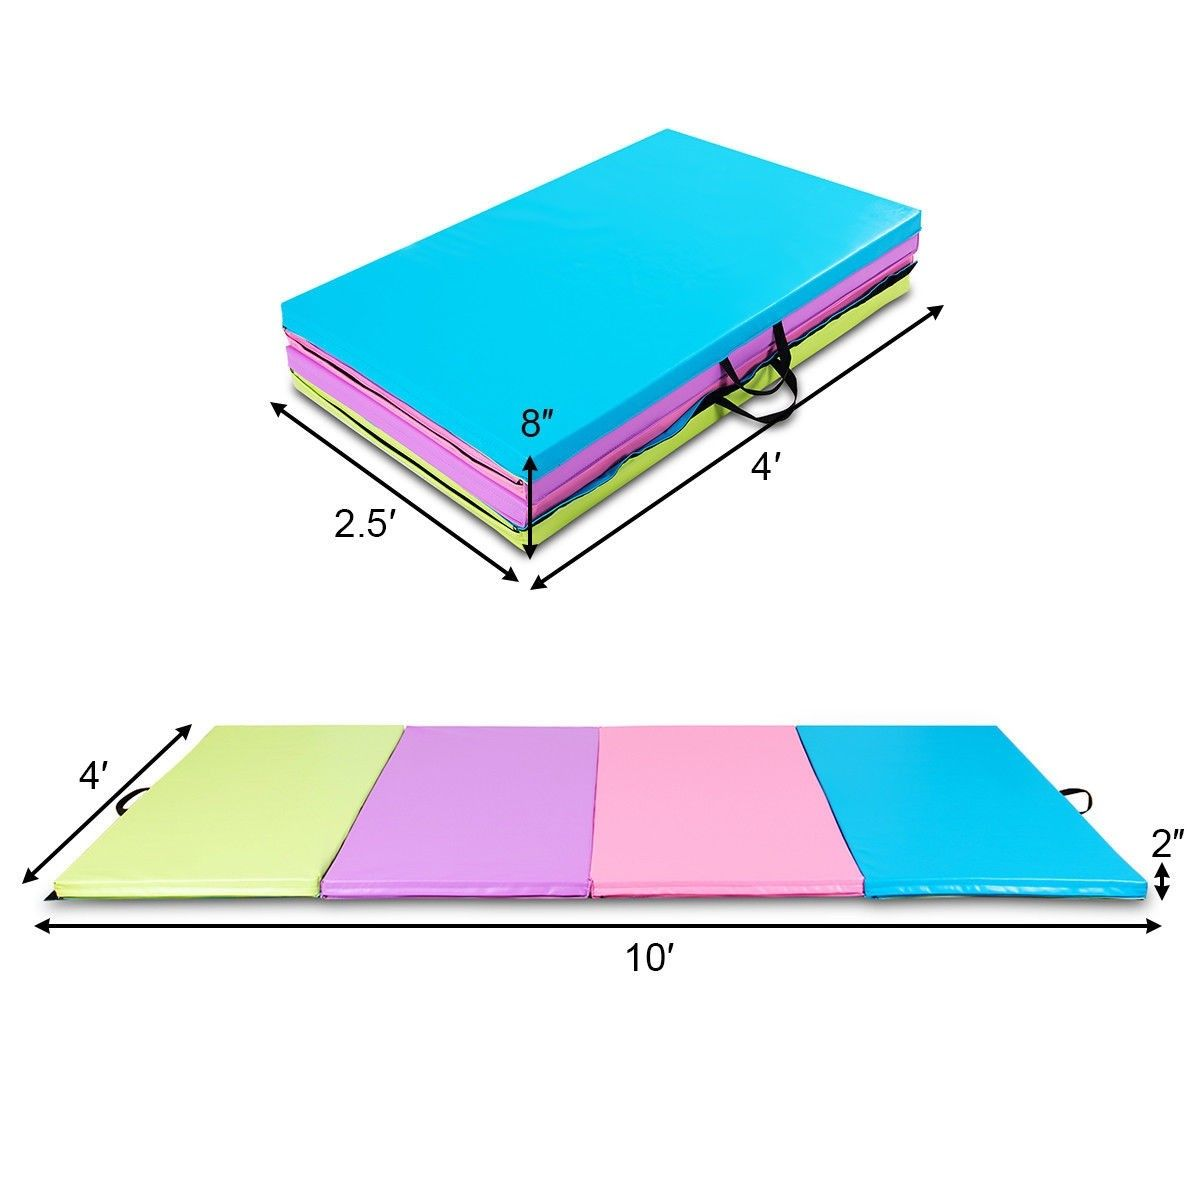 "4' x 10' x 2"" Multicolor Portable Folding PU Gymnastics"